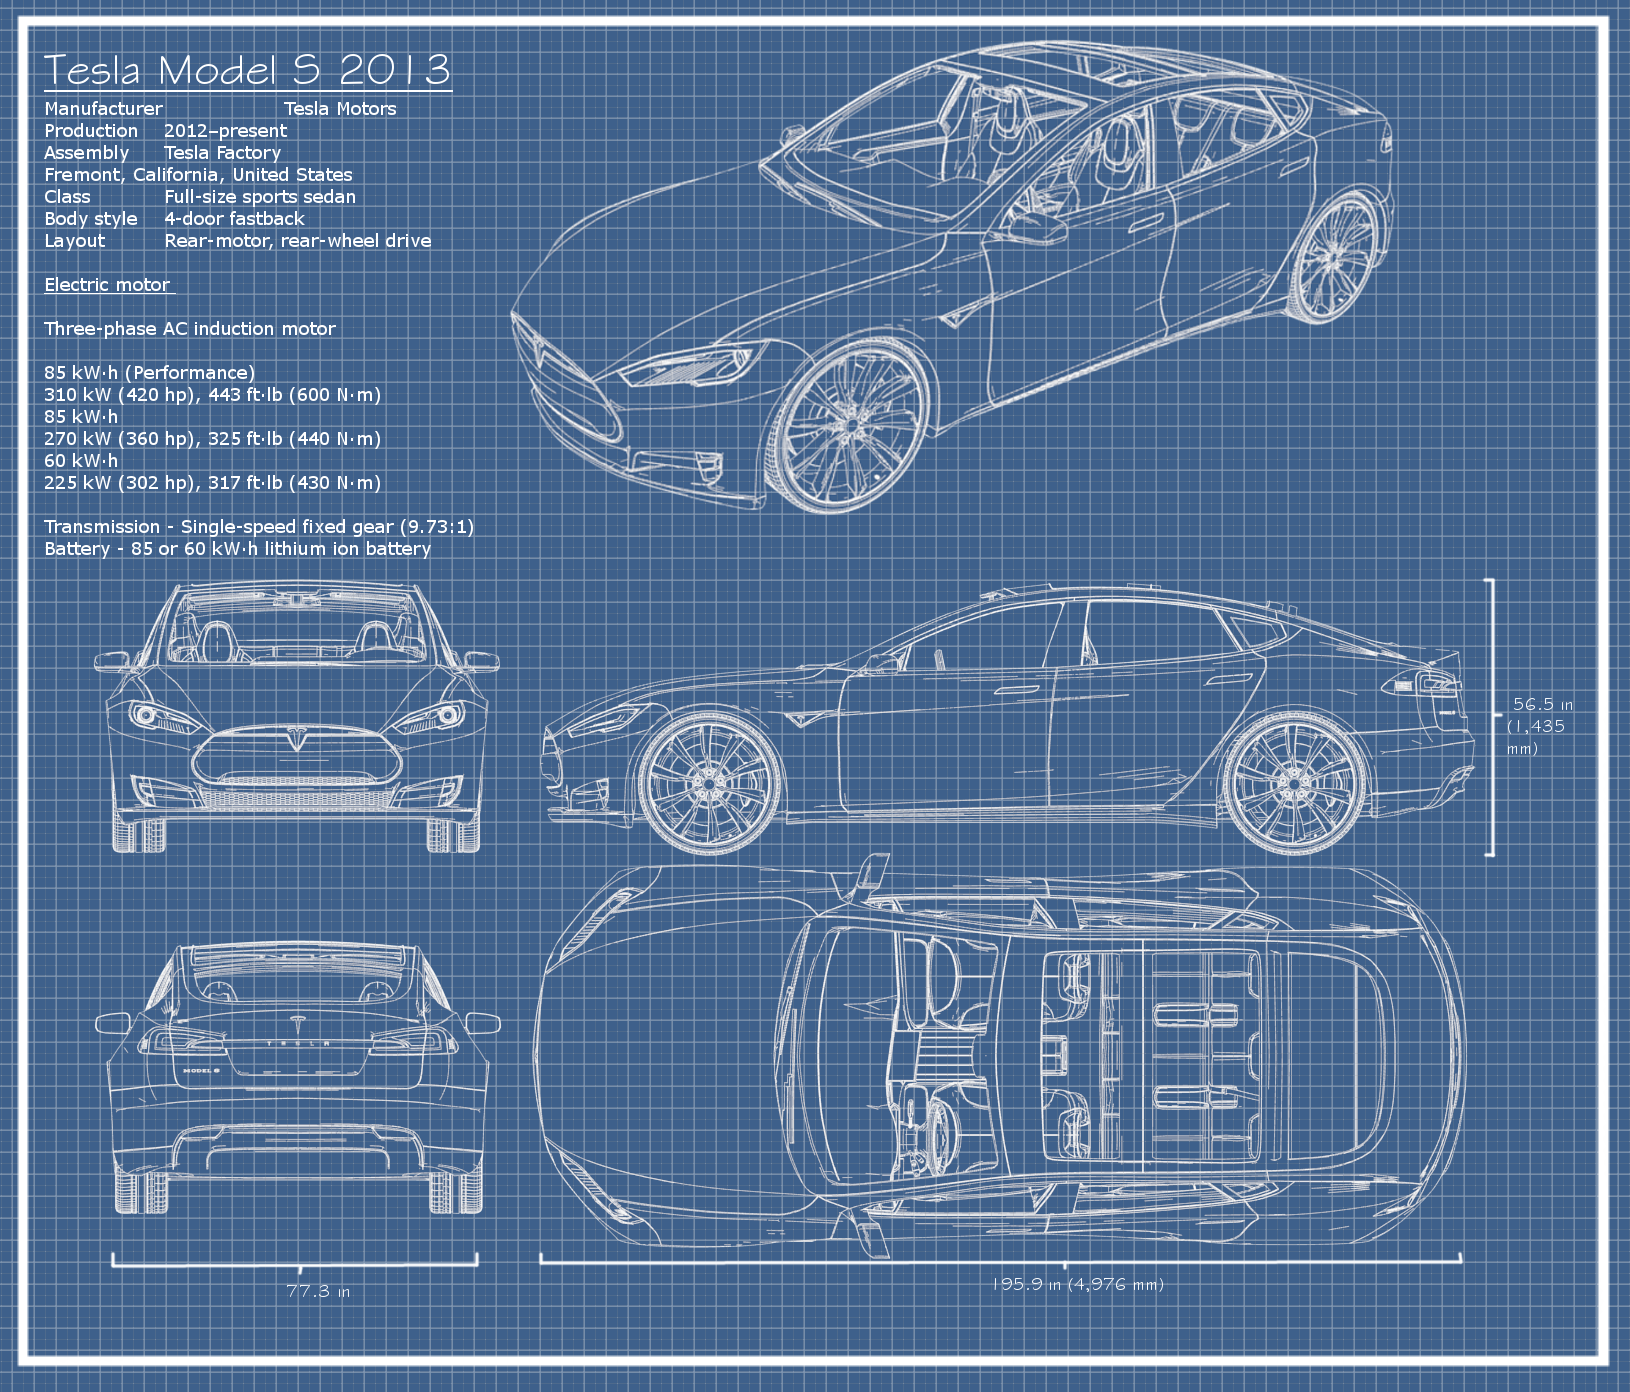 Freestyle model s blueprint finished projects blender artists modelsblueprint2g1630x1392 914 kb malvernweather Gallery